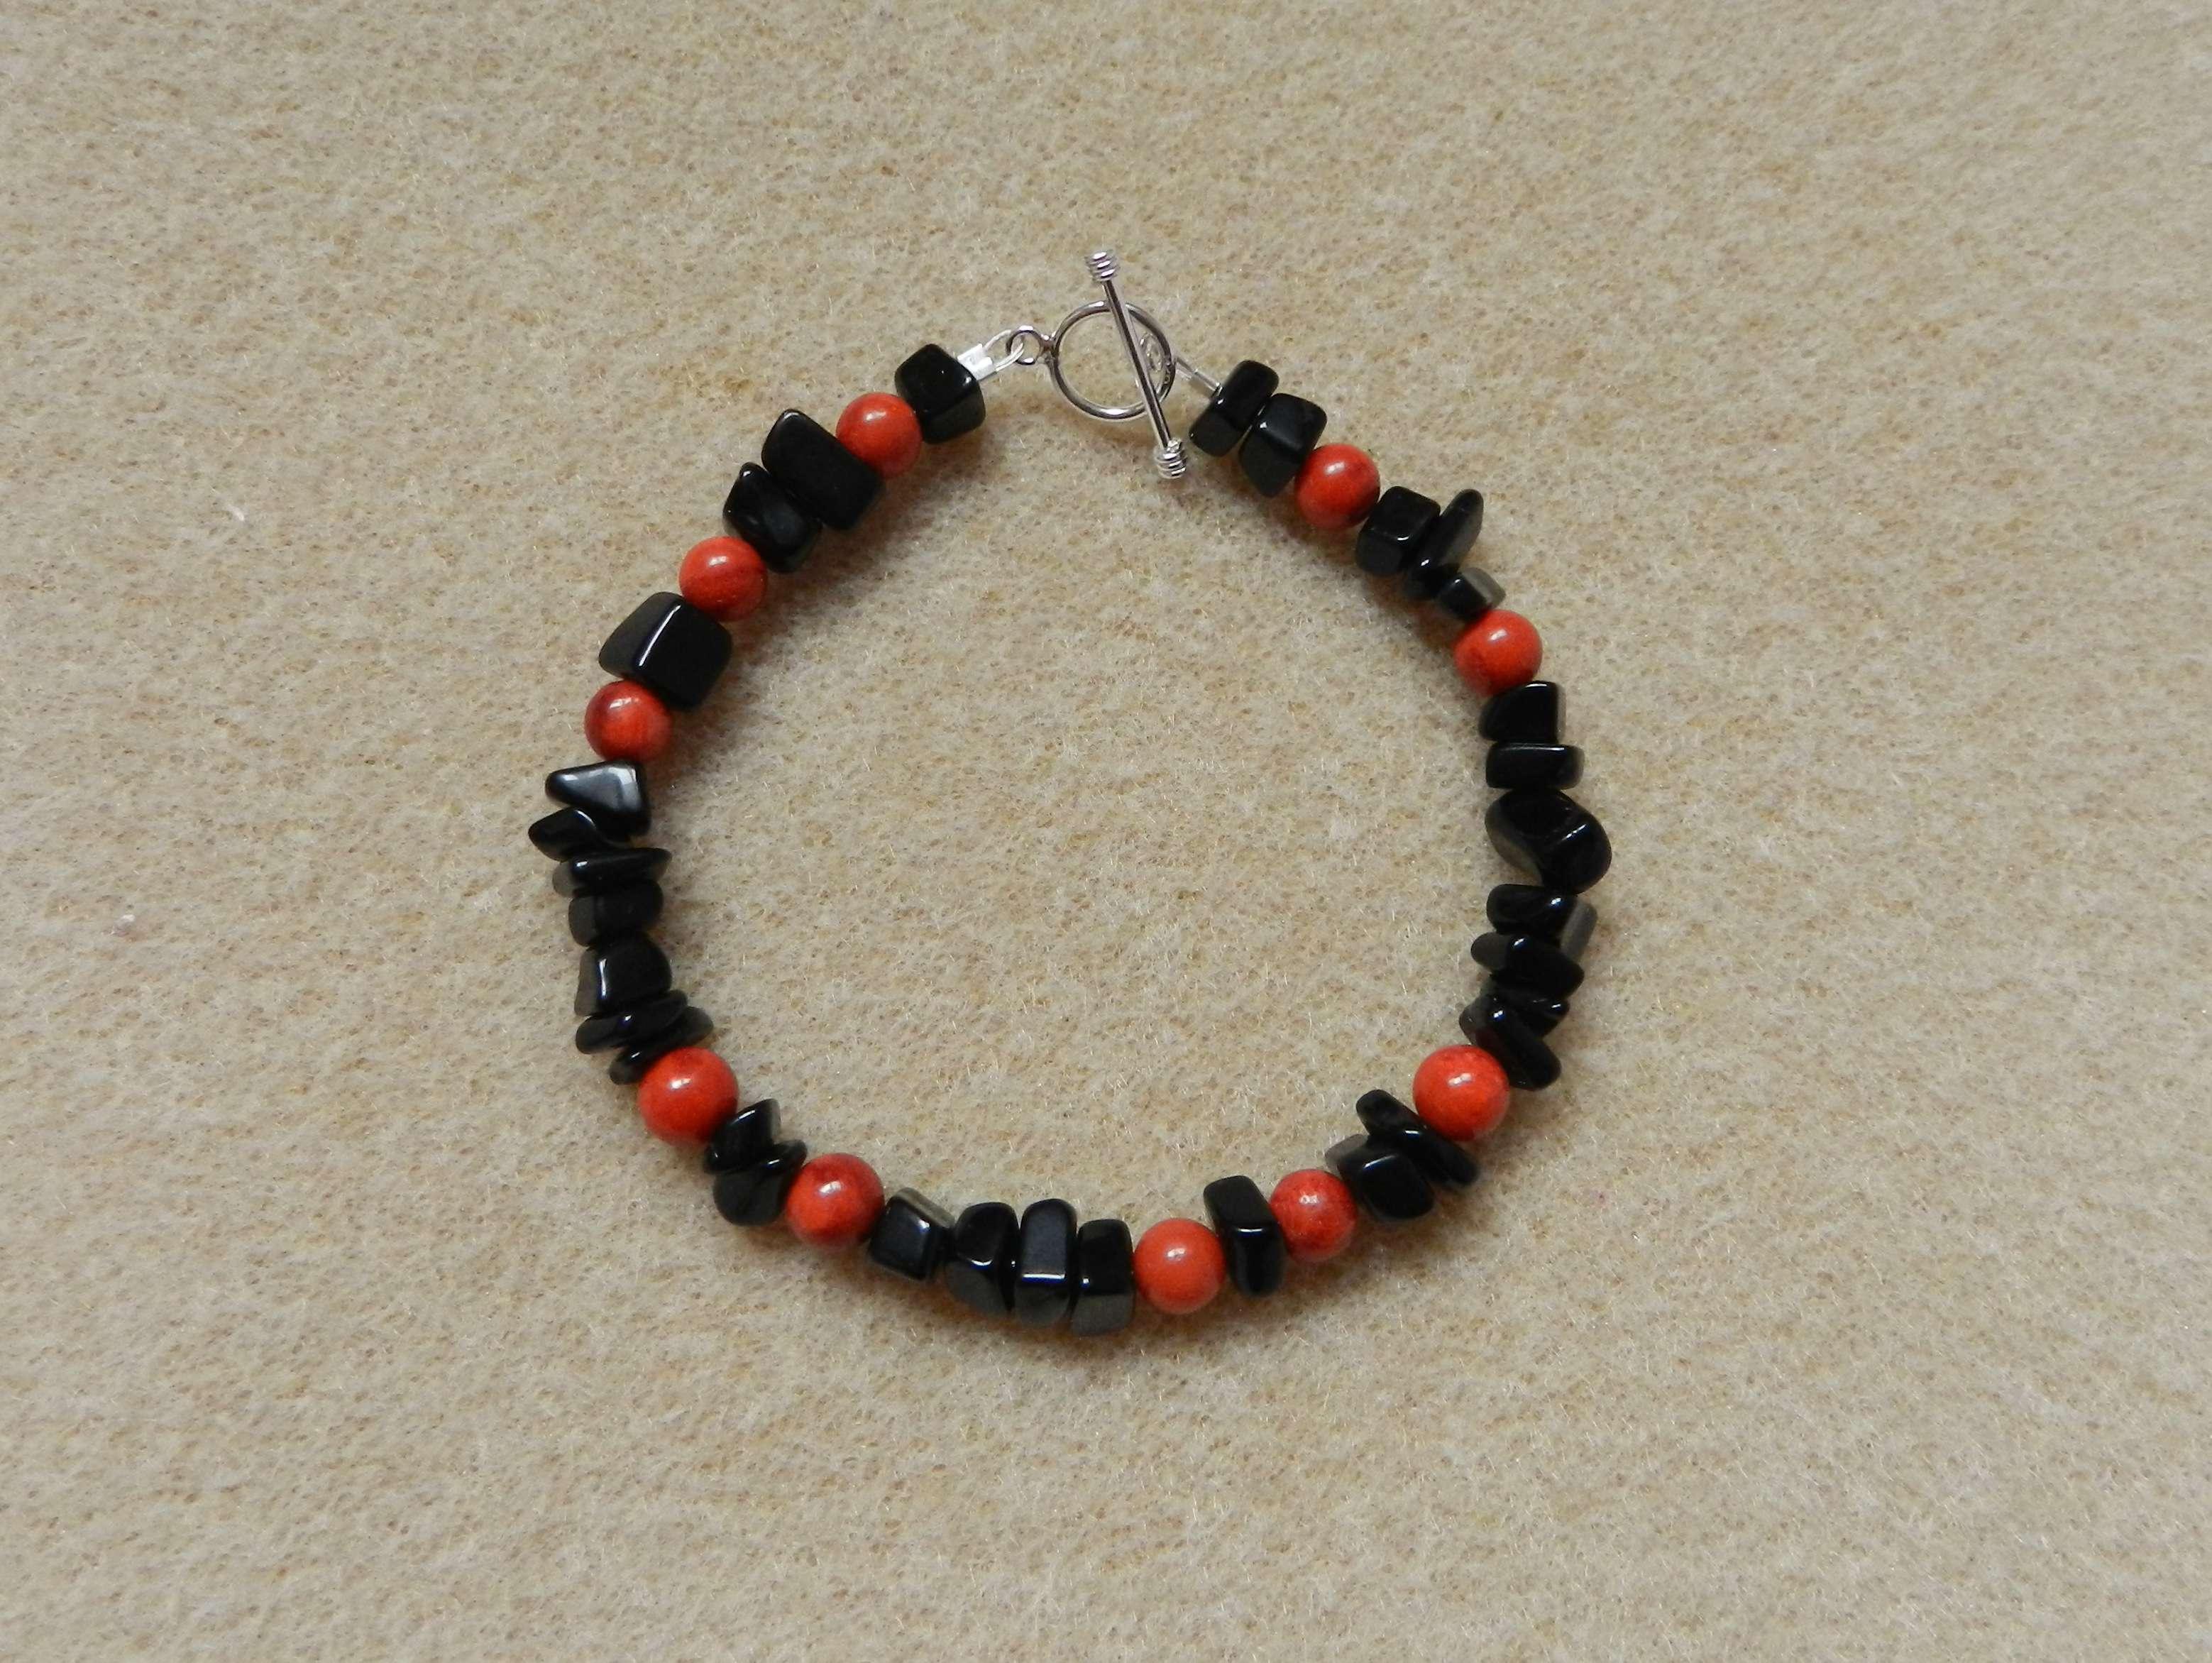 Black onyx chips and sponge coral bracelet